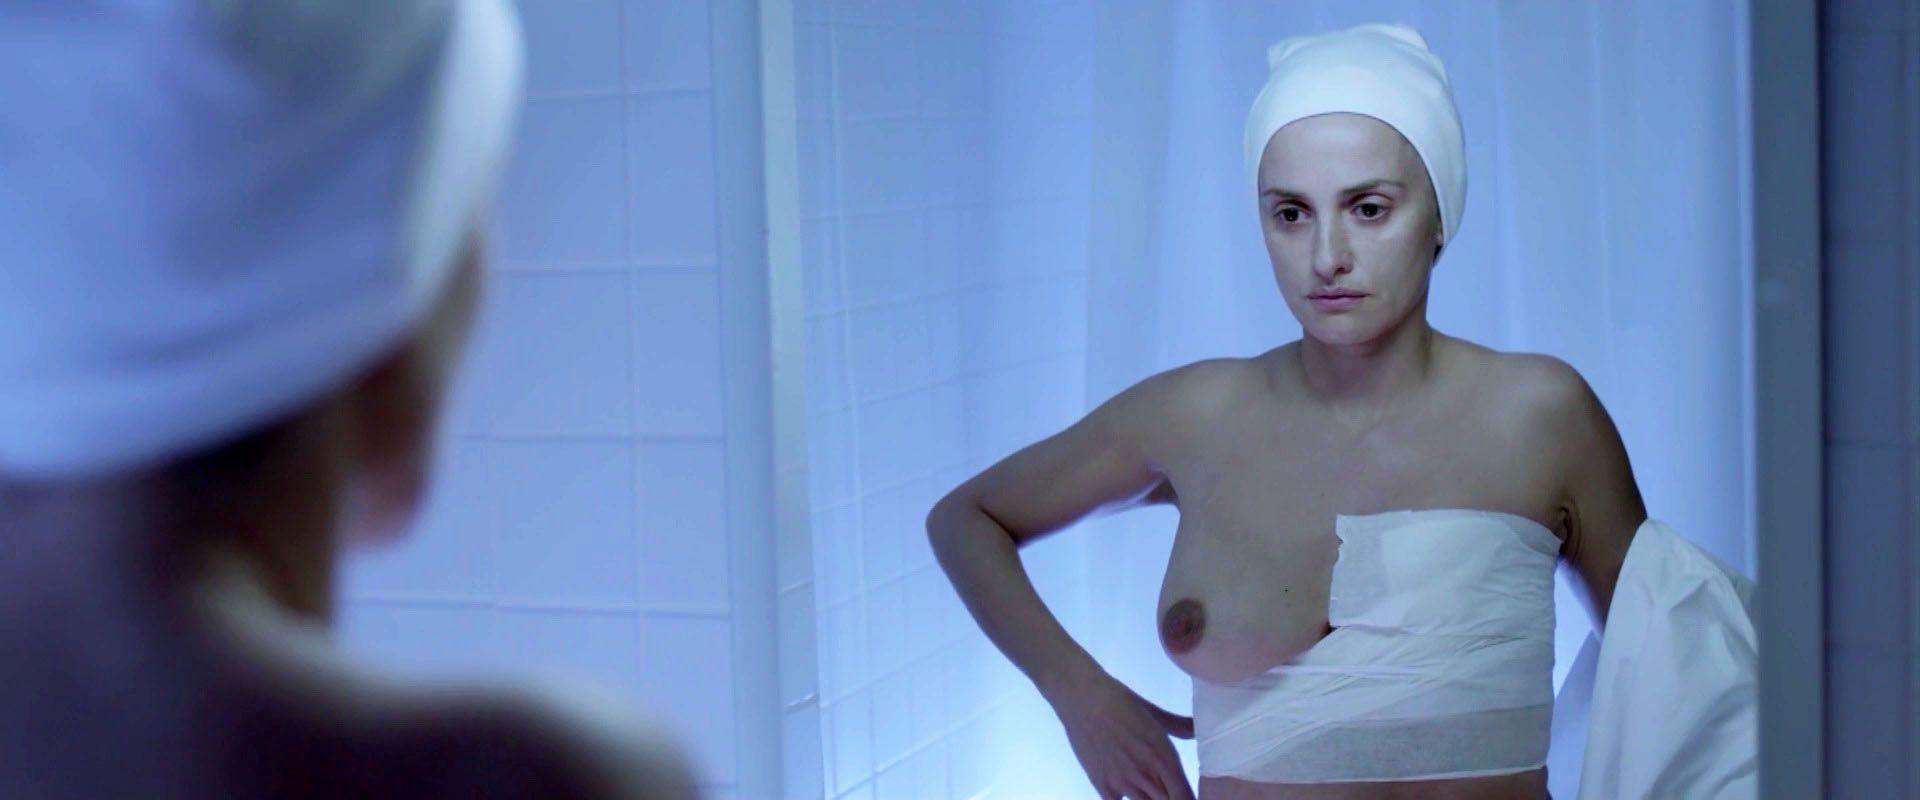 Penelope Cruz Fappening photo 22